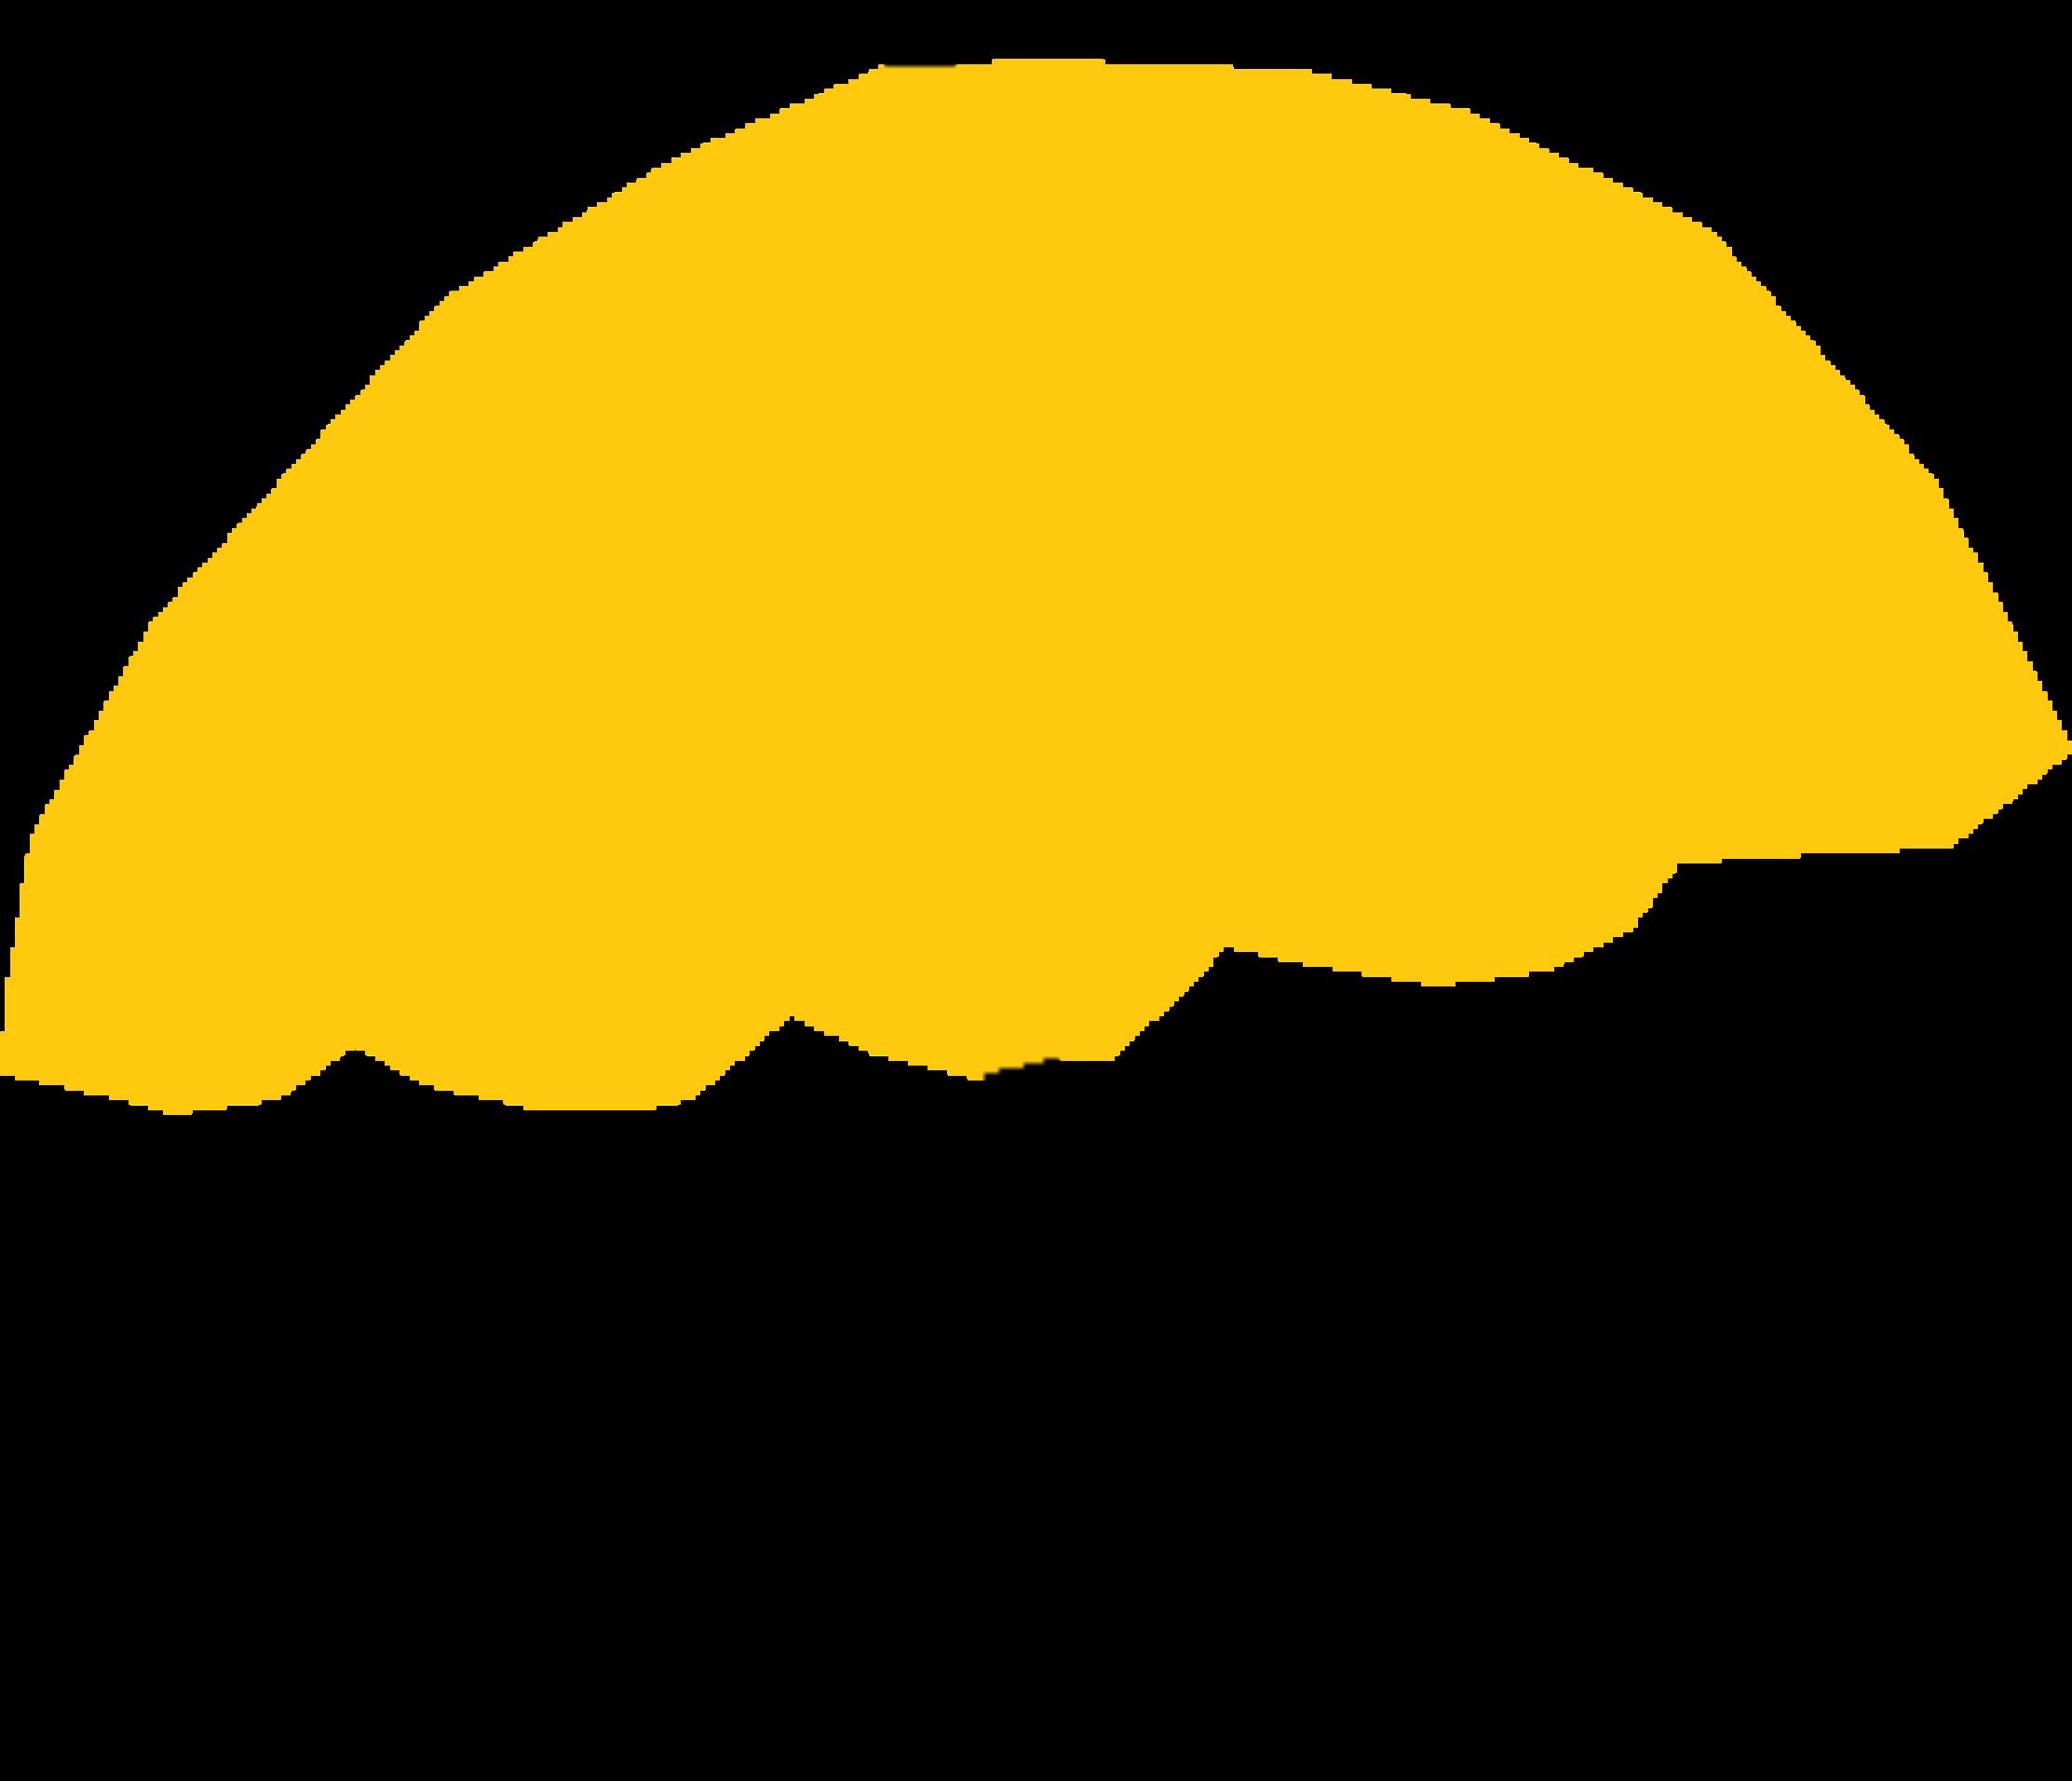 Yellow Umbrella Vector Clipart image - Free stock photo ...